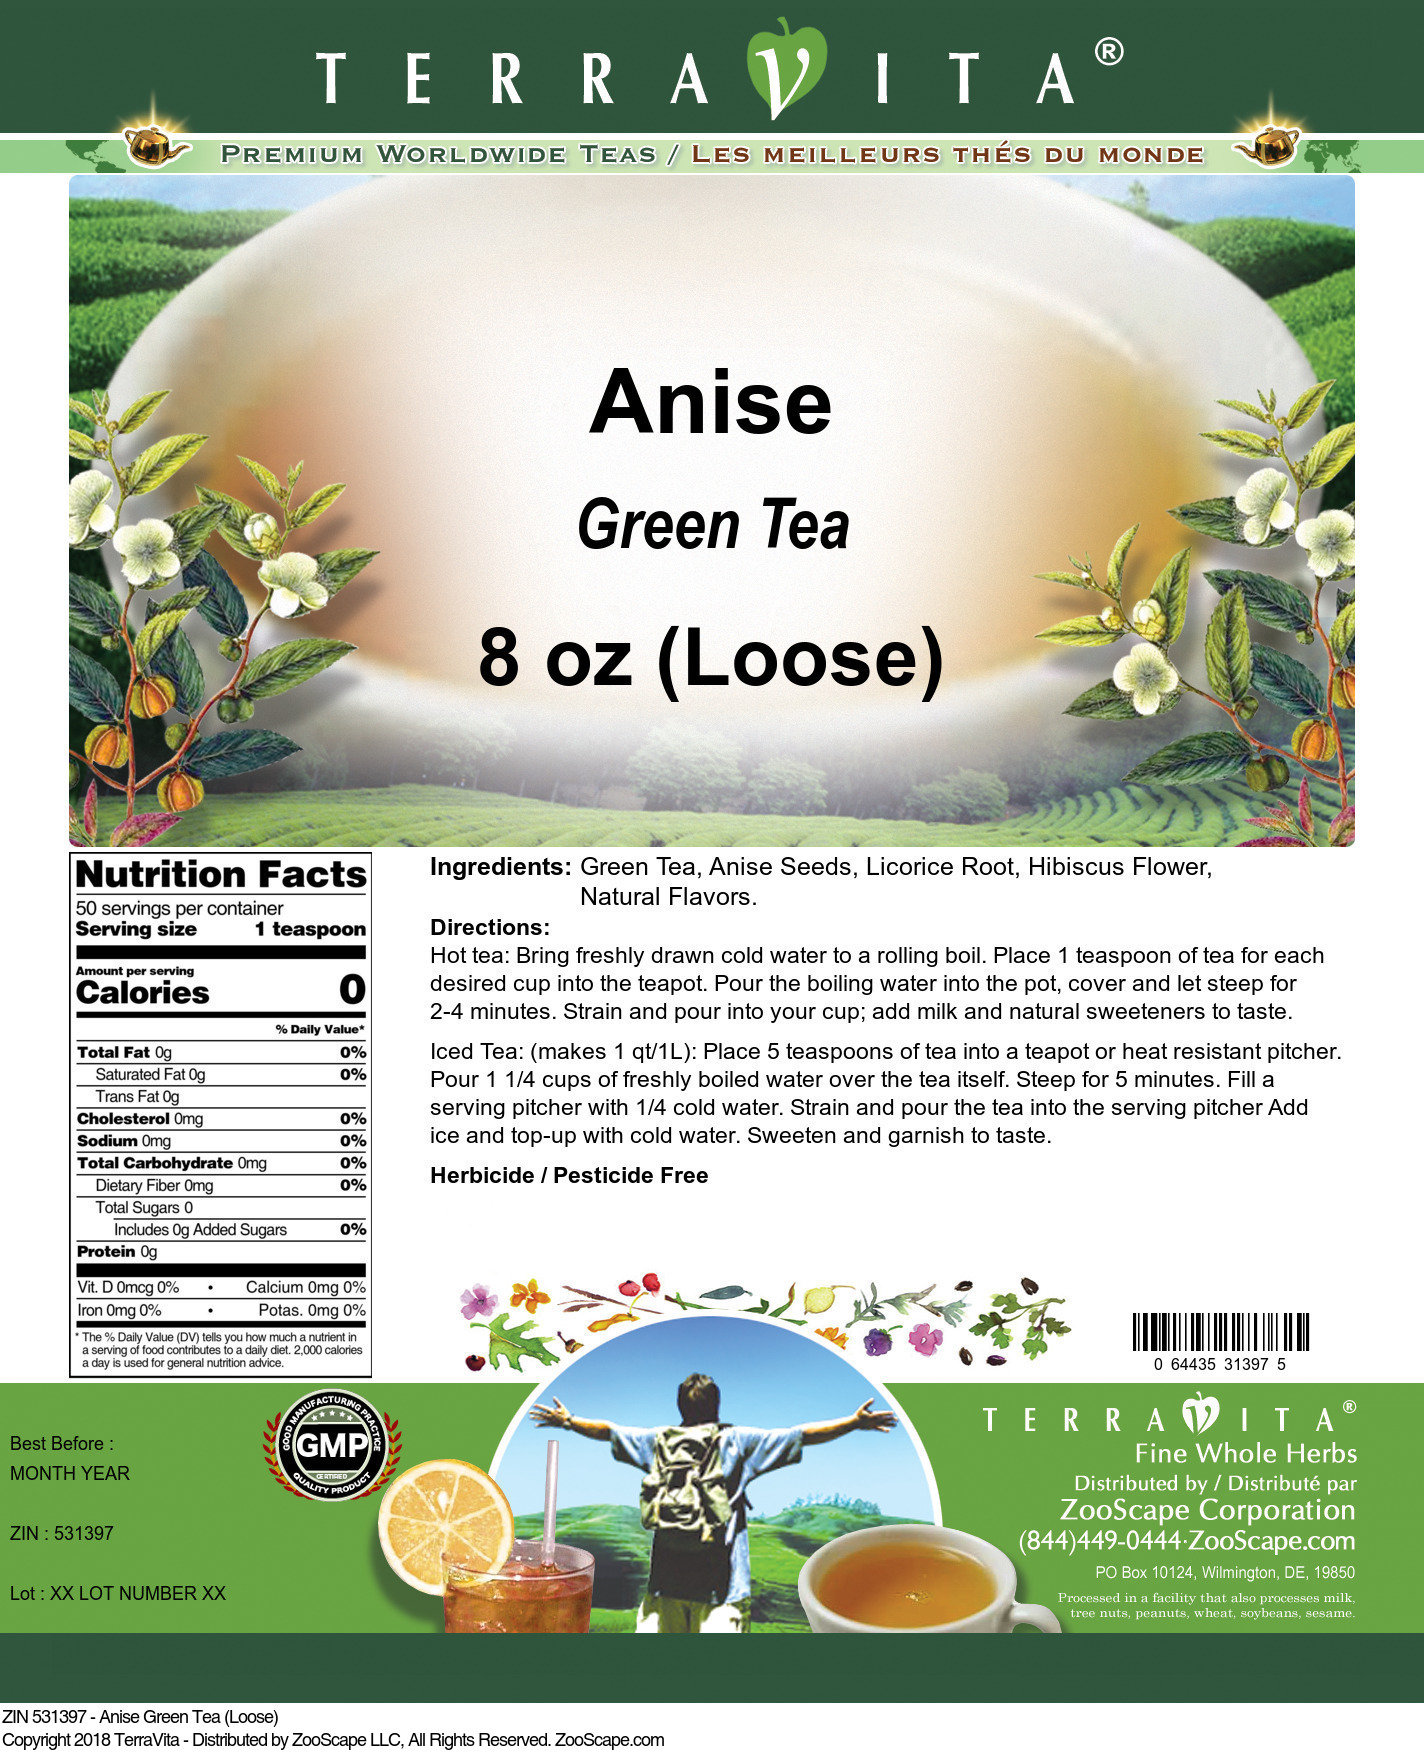 Anise Green Tea (Loose)